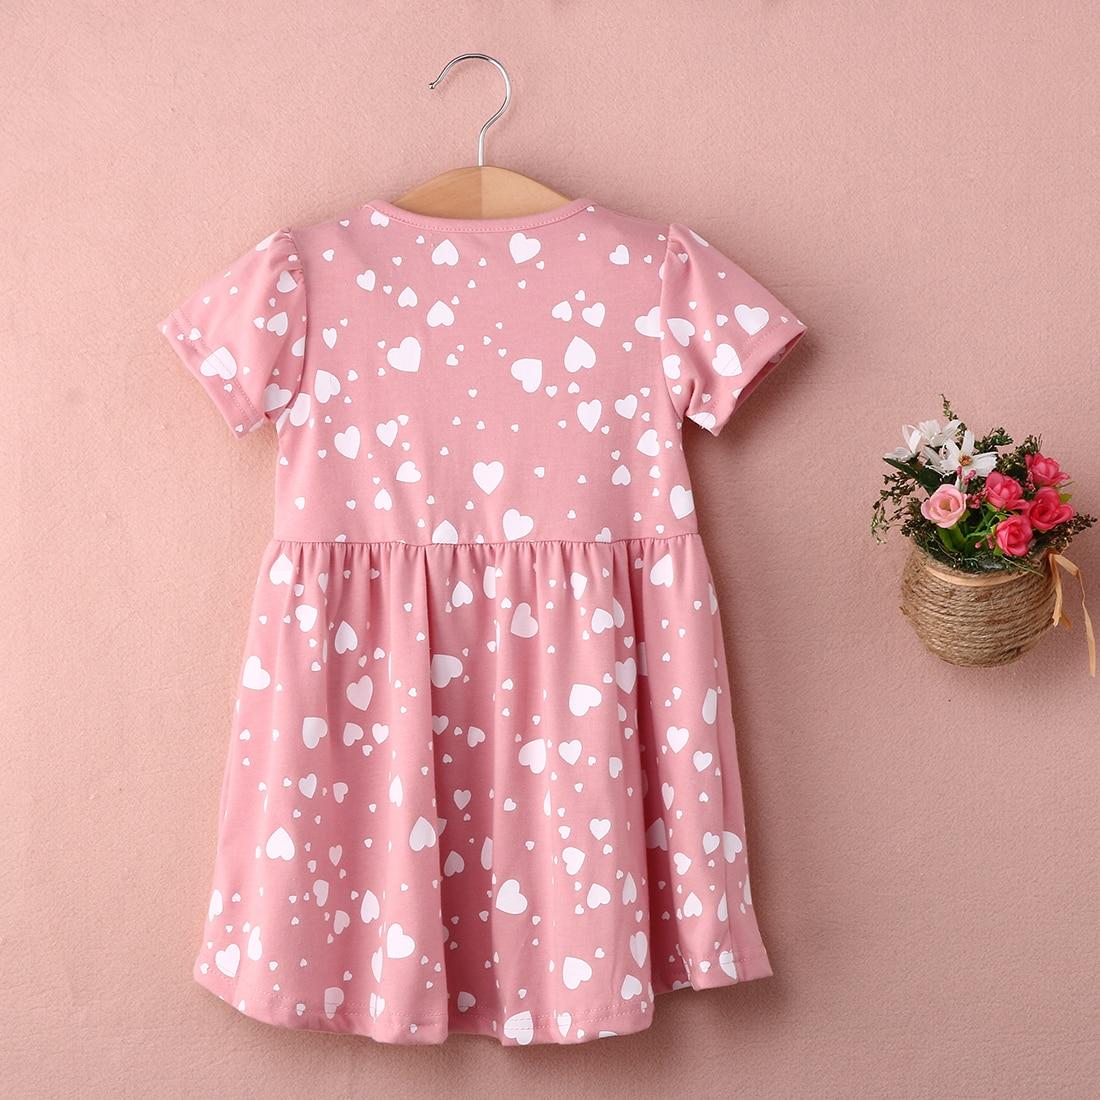 2018 Bnwt Toddler Kids Girls Summer Dress Princess Short Sleeve Floral Casual Beach Mini Dresses by Pudcoco